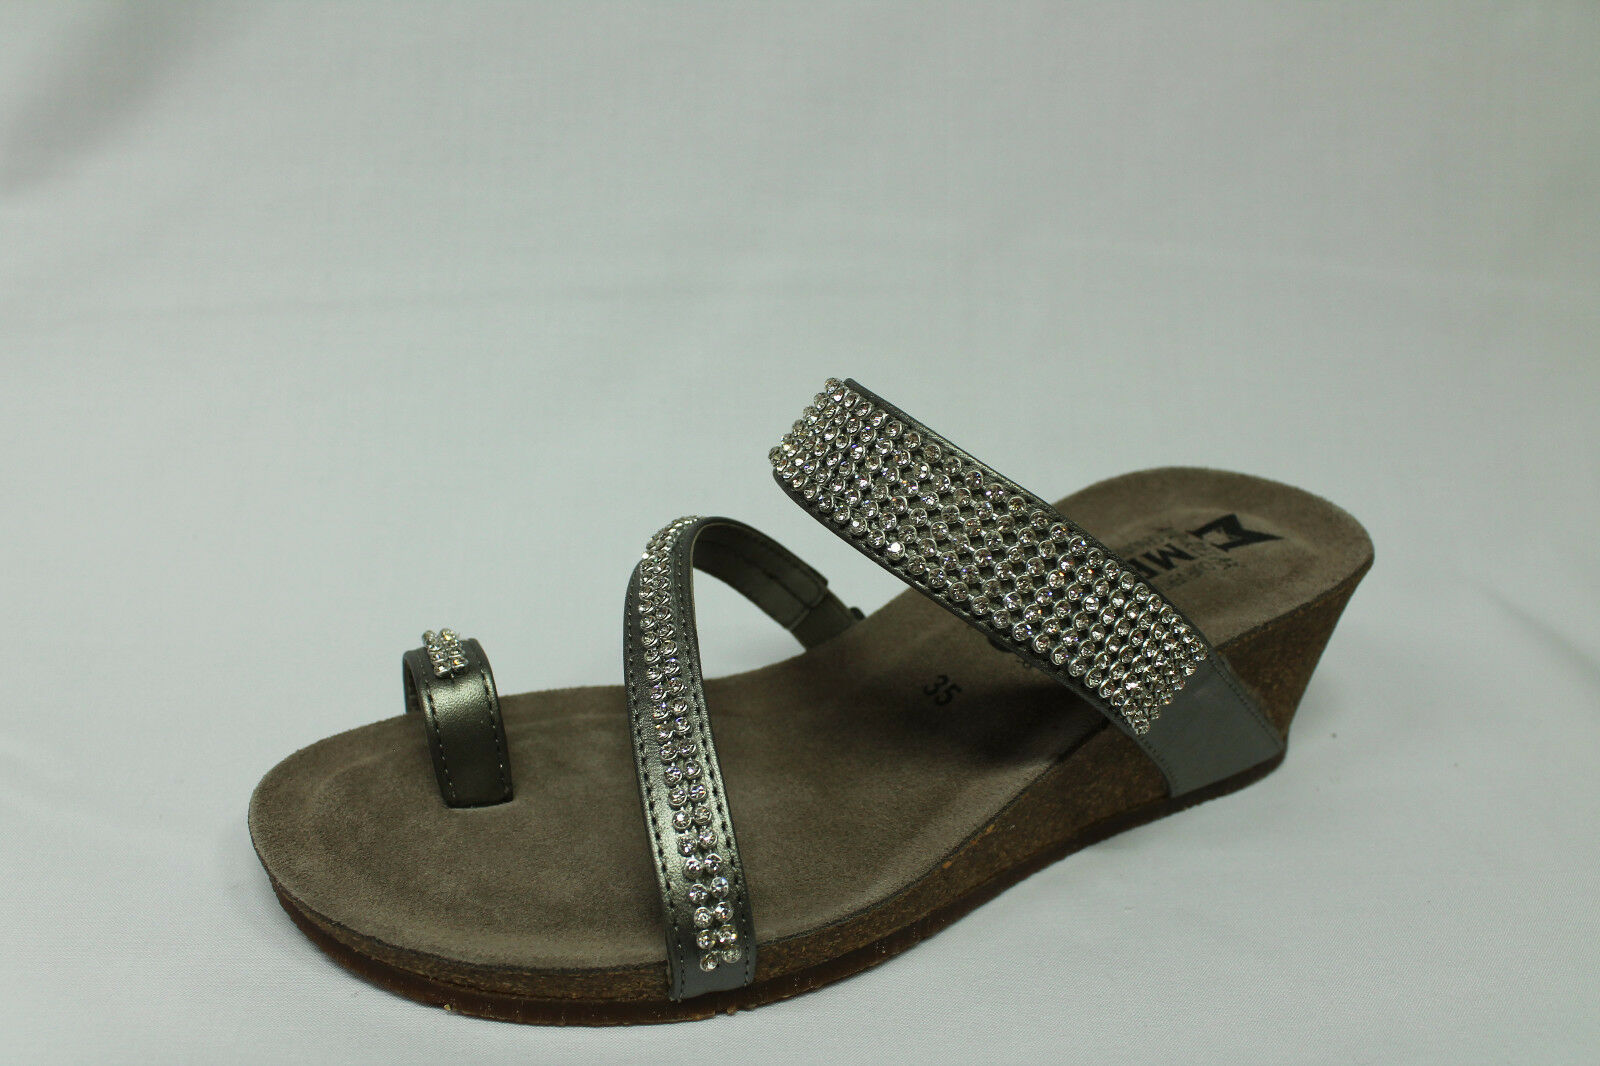 Ciabatte sandali infradito con zeppa Mephisto Milly plata listino listino listino - 20% 504b02